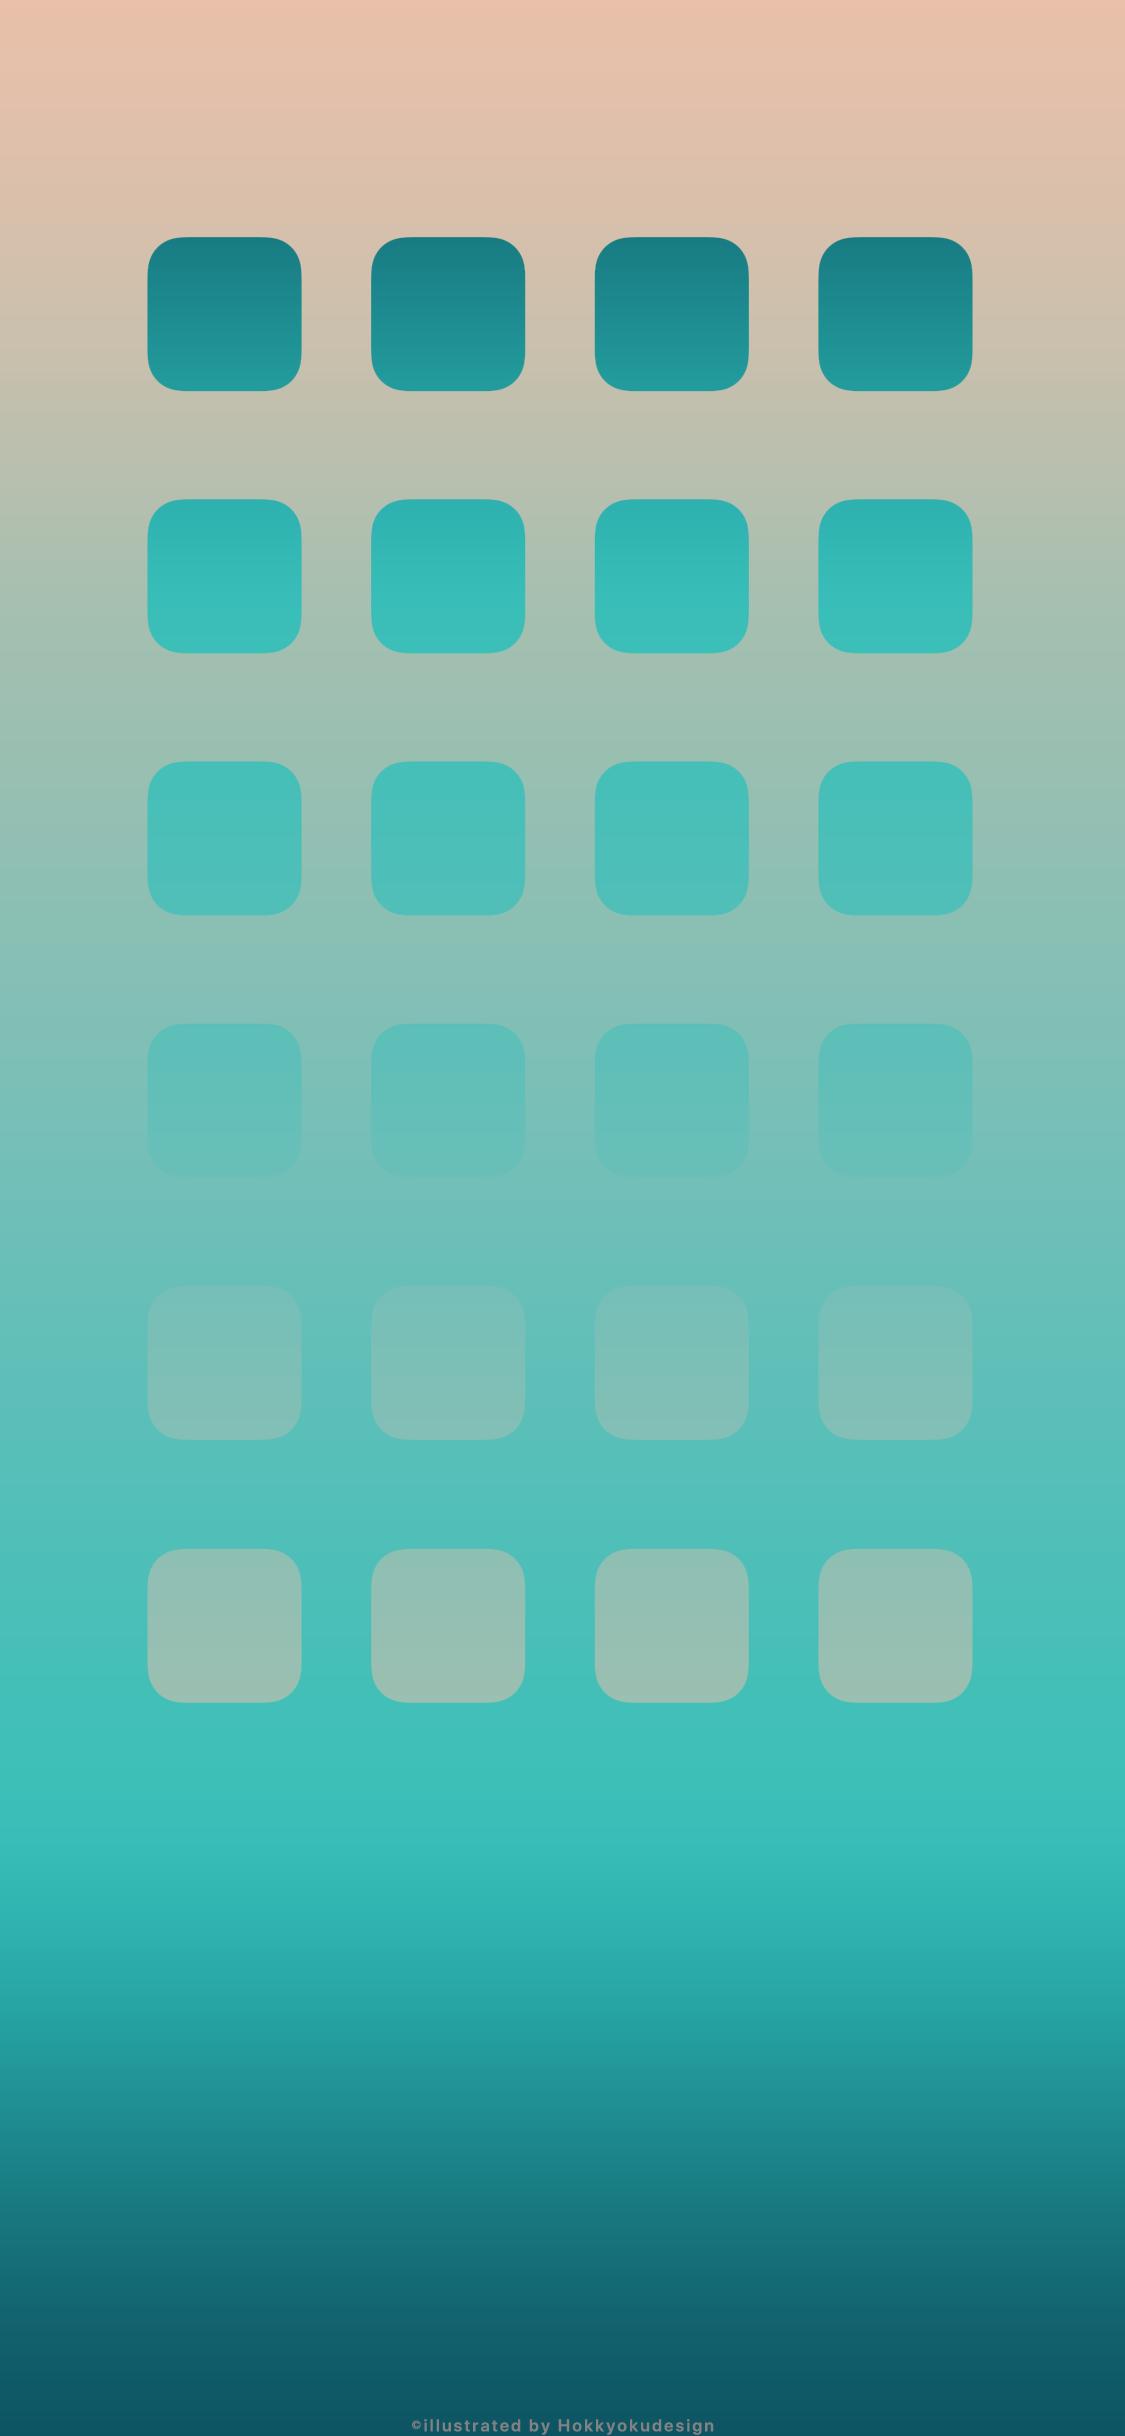 Iphone X壁紙 4 Ios11グラデーション